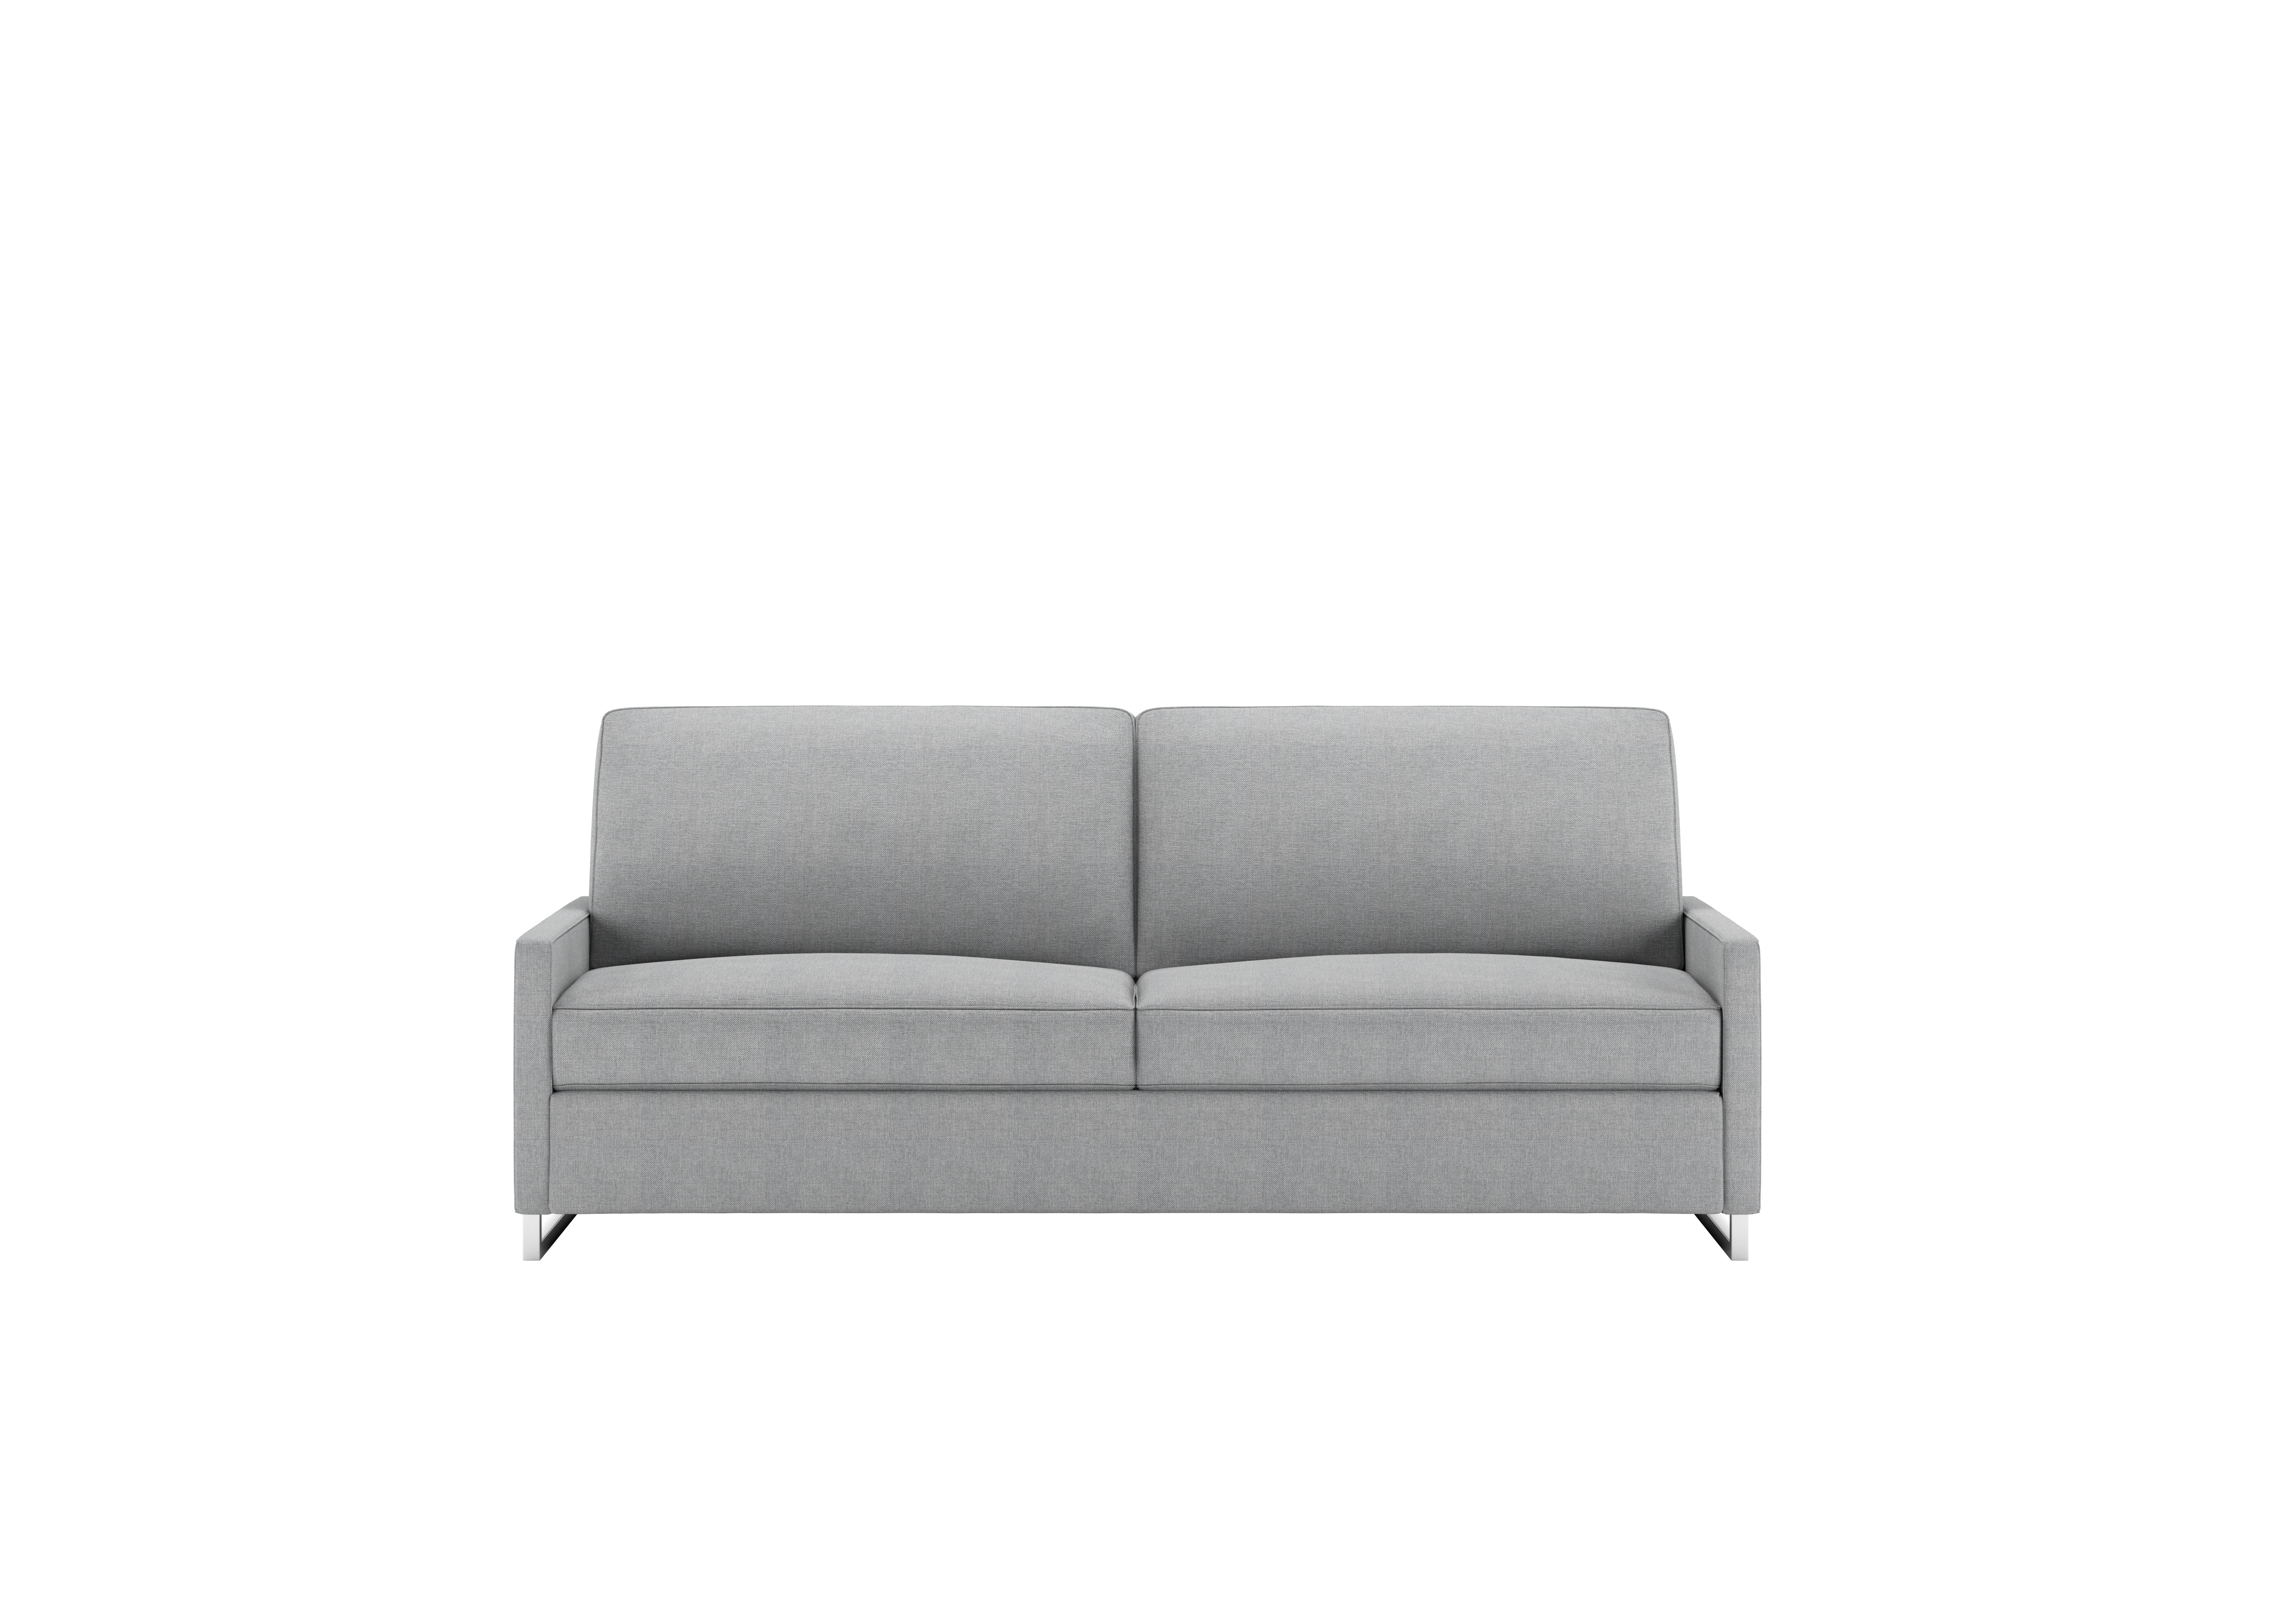 2019 American Leather Sleeper Sofa